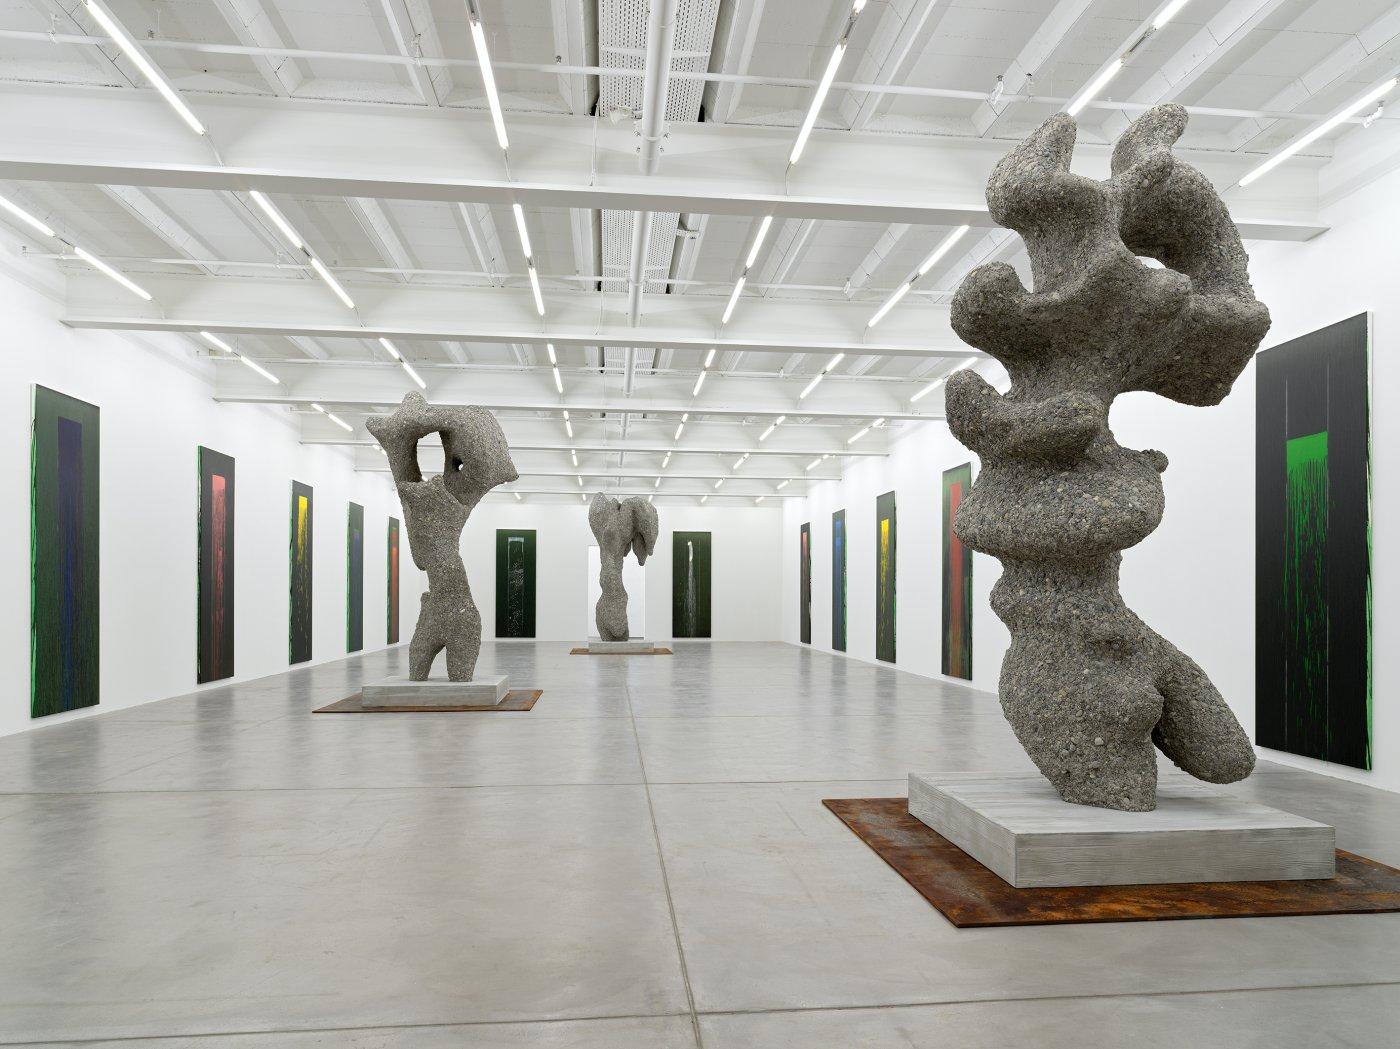 Galerie Eva Presenhuber Pat Steir Ugo Rondinone 4